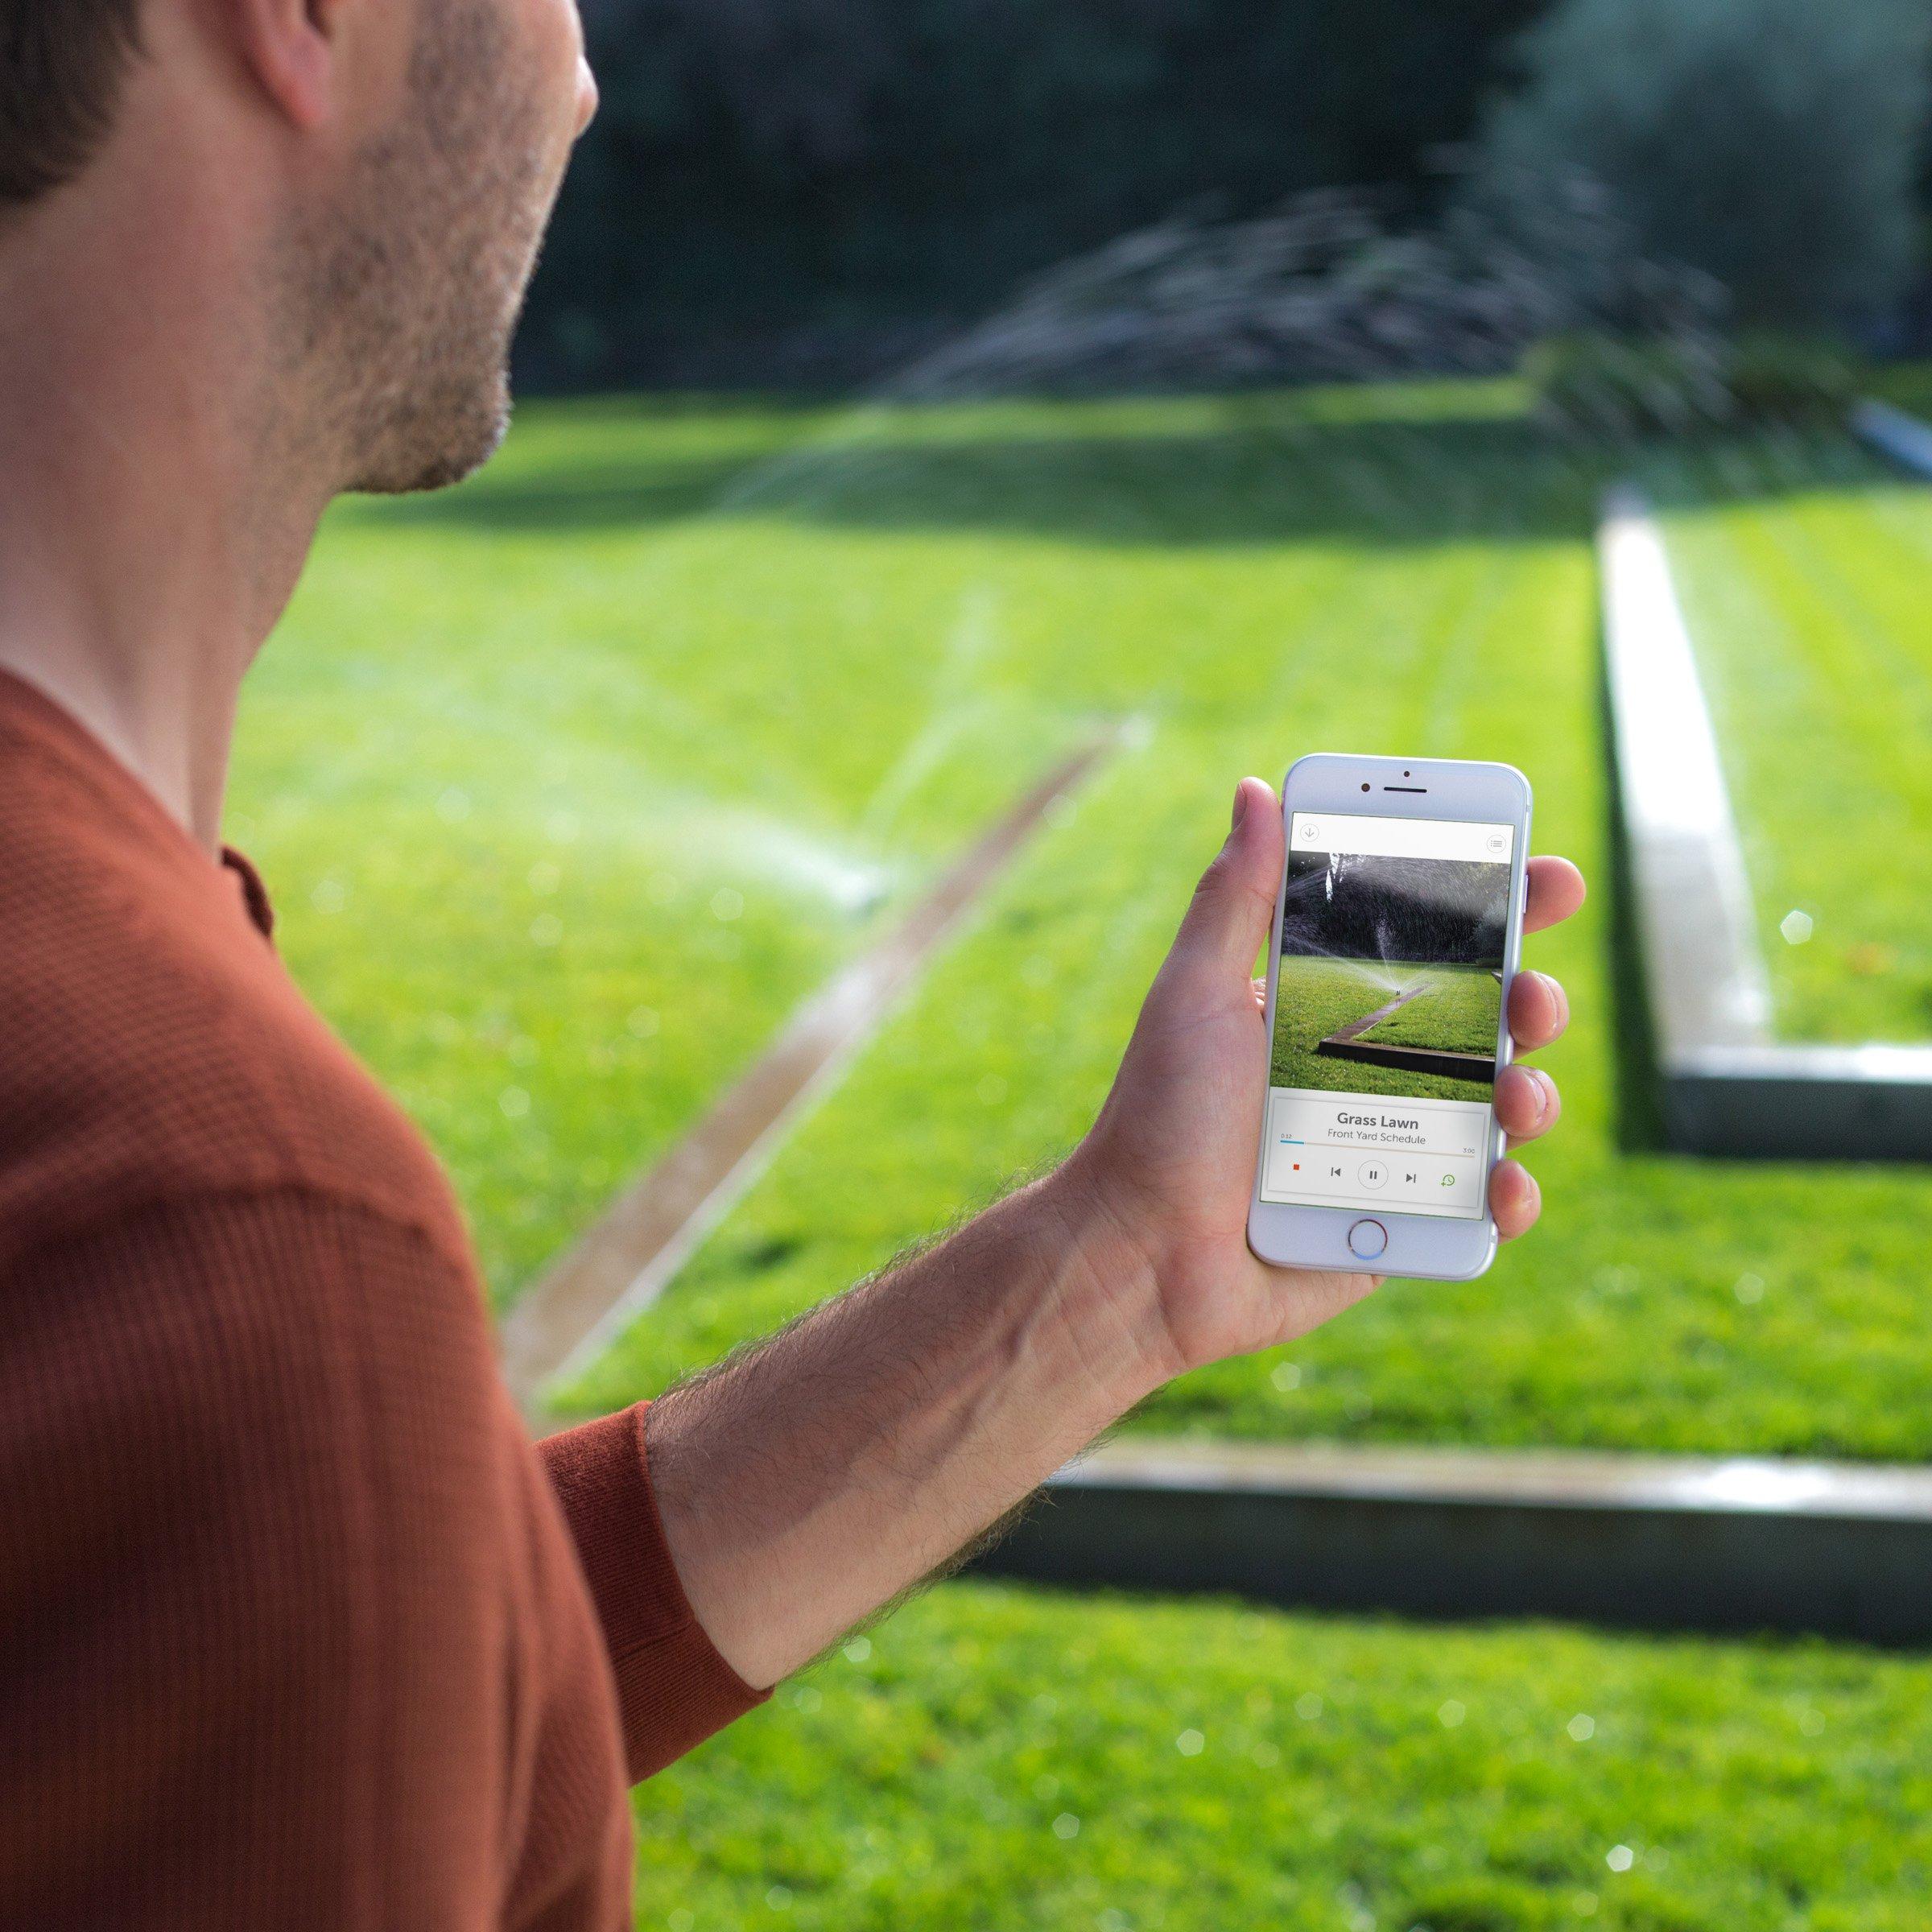 Rachio Smart Sprinkler Controller, WiFi, 8 Zone 2nd Generation, Works with Amazon Alexa by Rachio (Image #6)